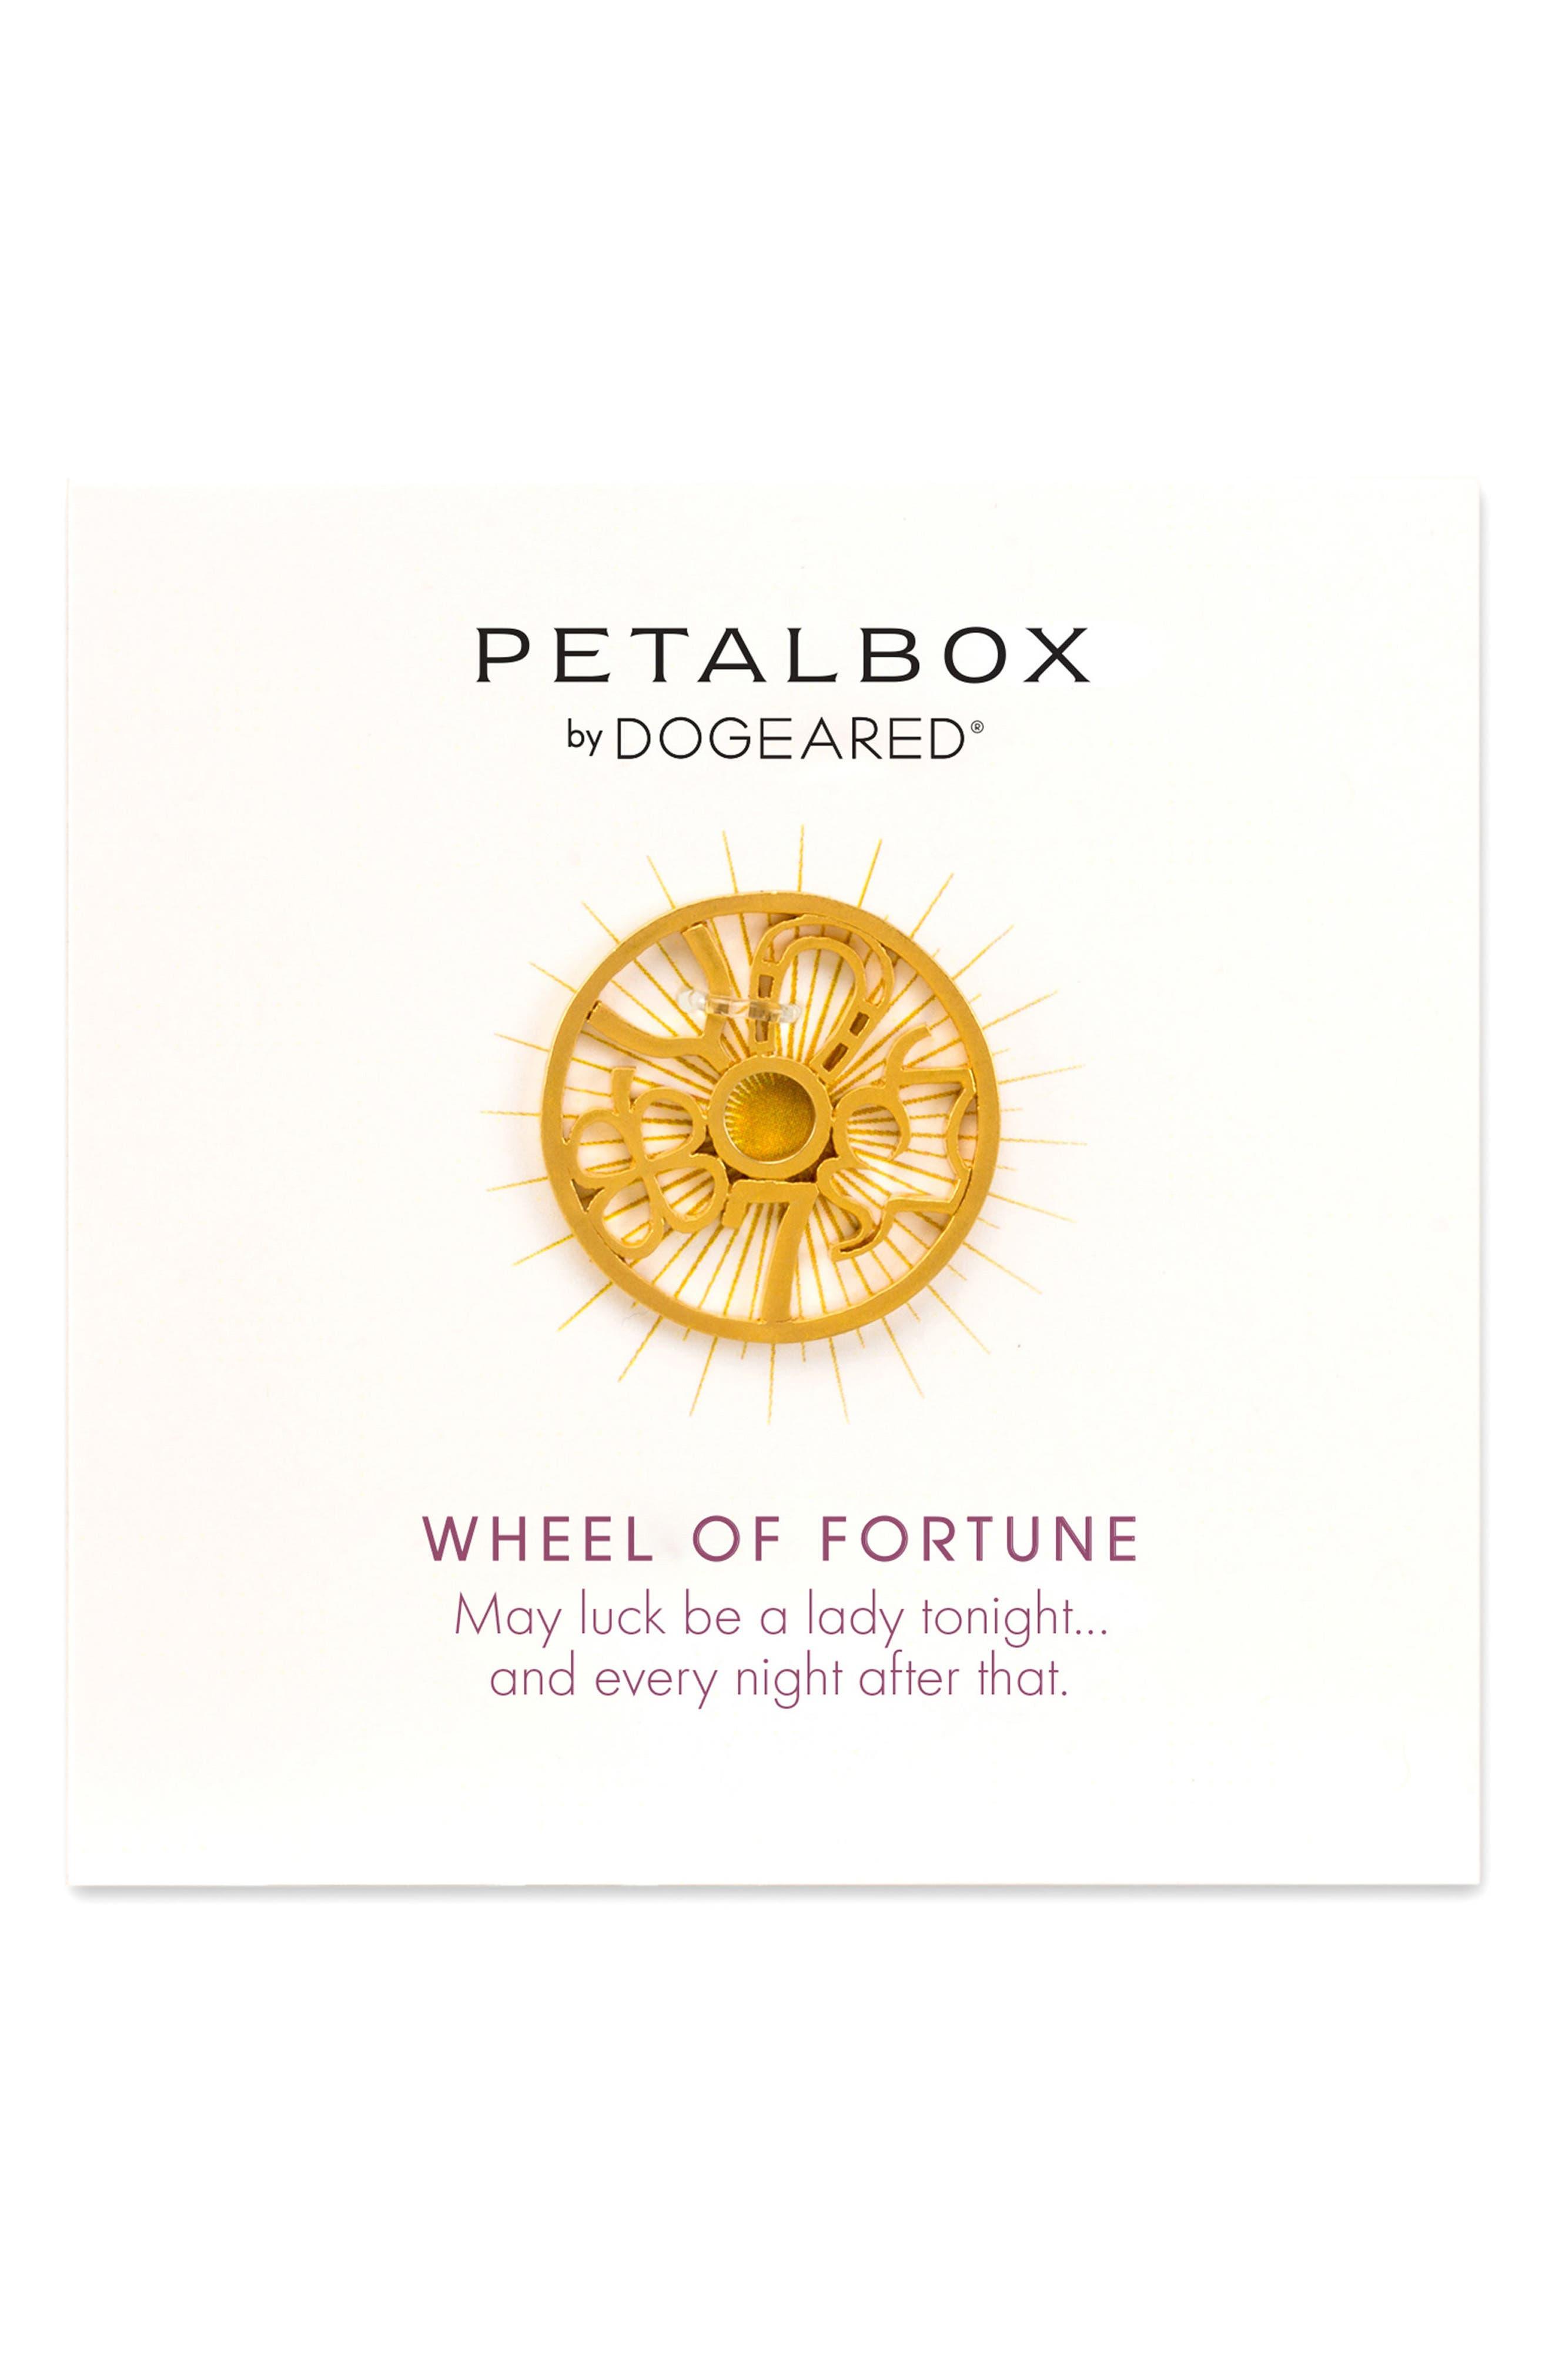 DOGEARED Pedalbox Wheel of Fortune Enhancer